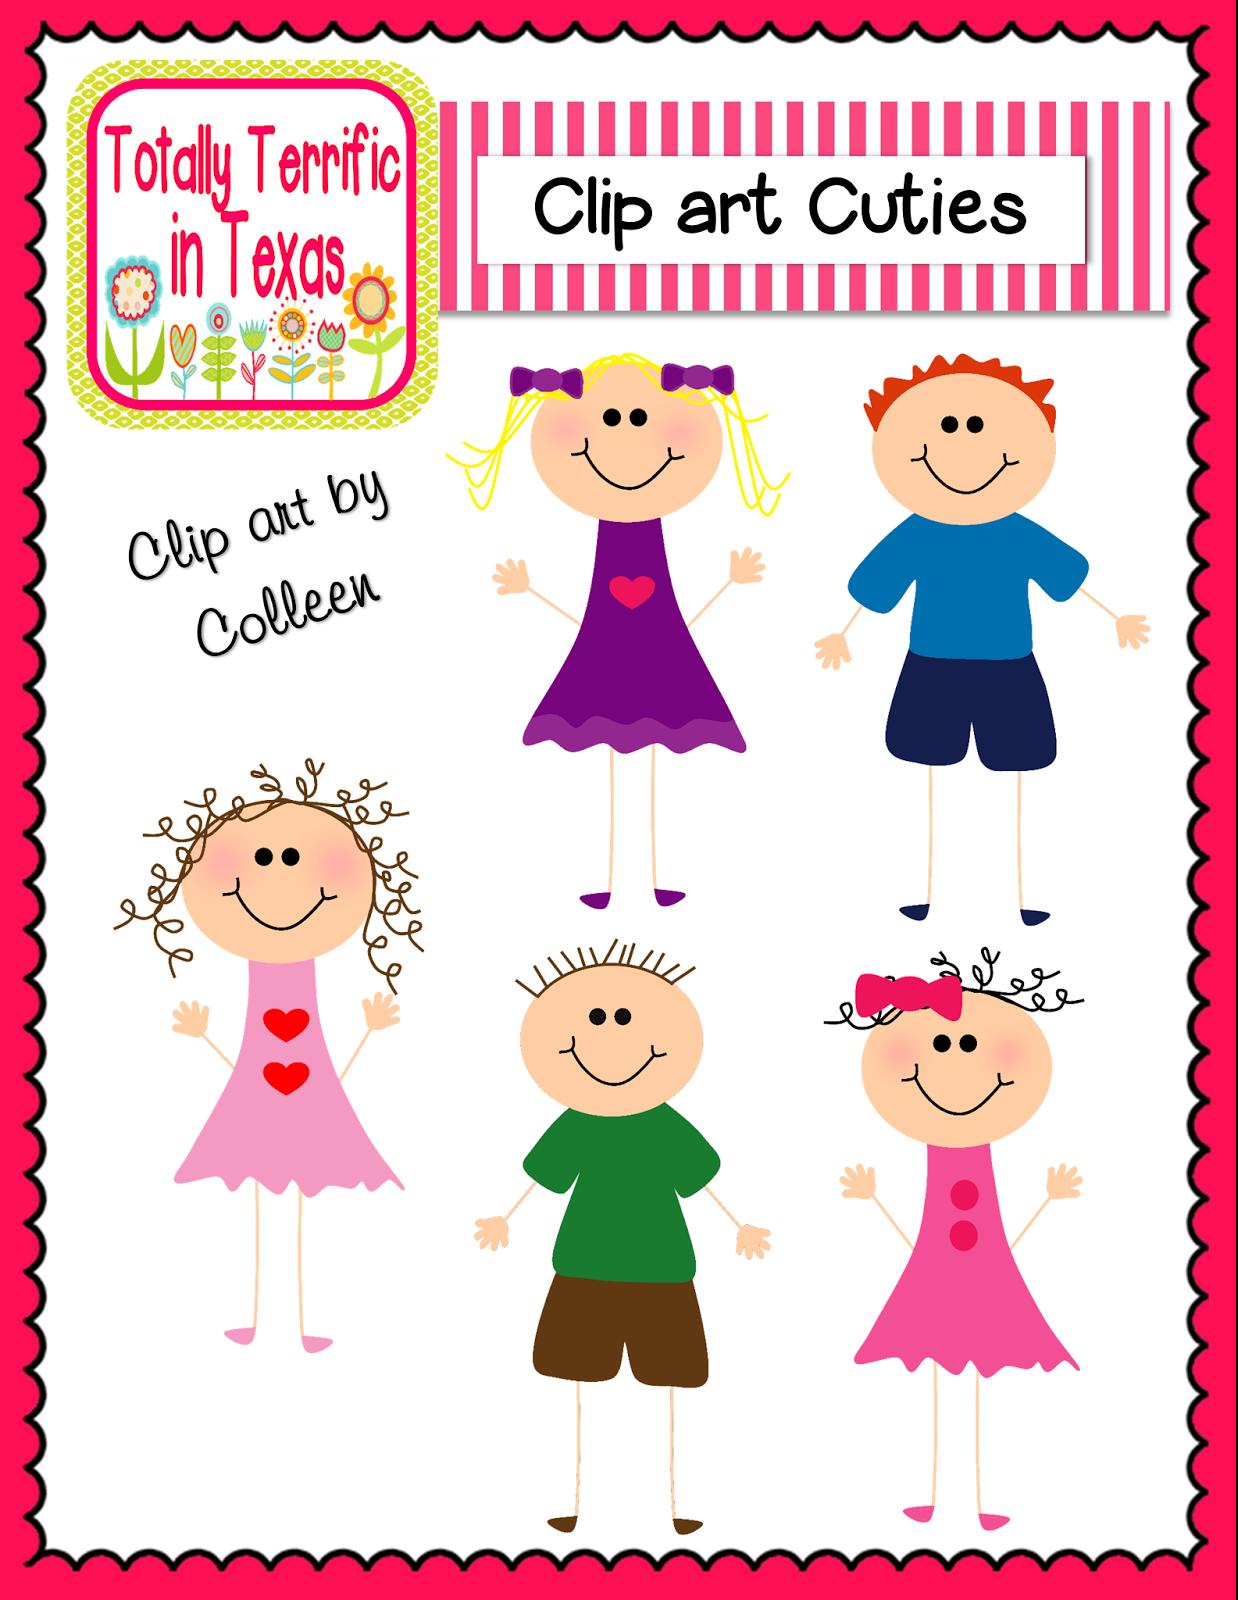 http://www.teacherspayteachers.com/Product/Clip-Art-Cuties-Color-1261347